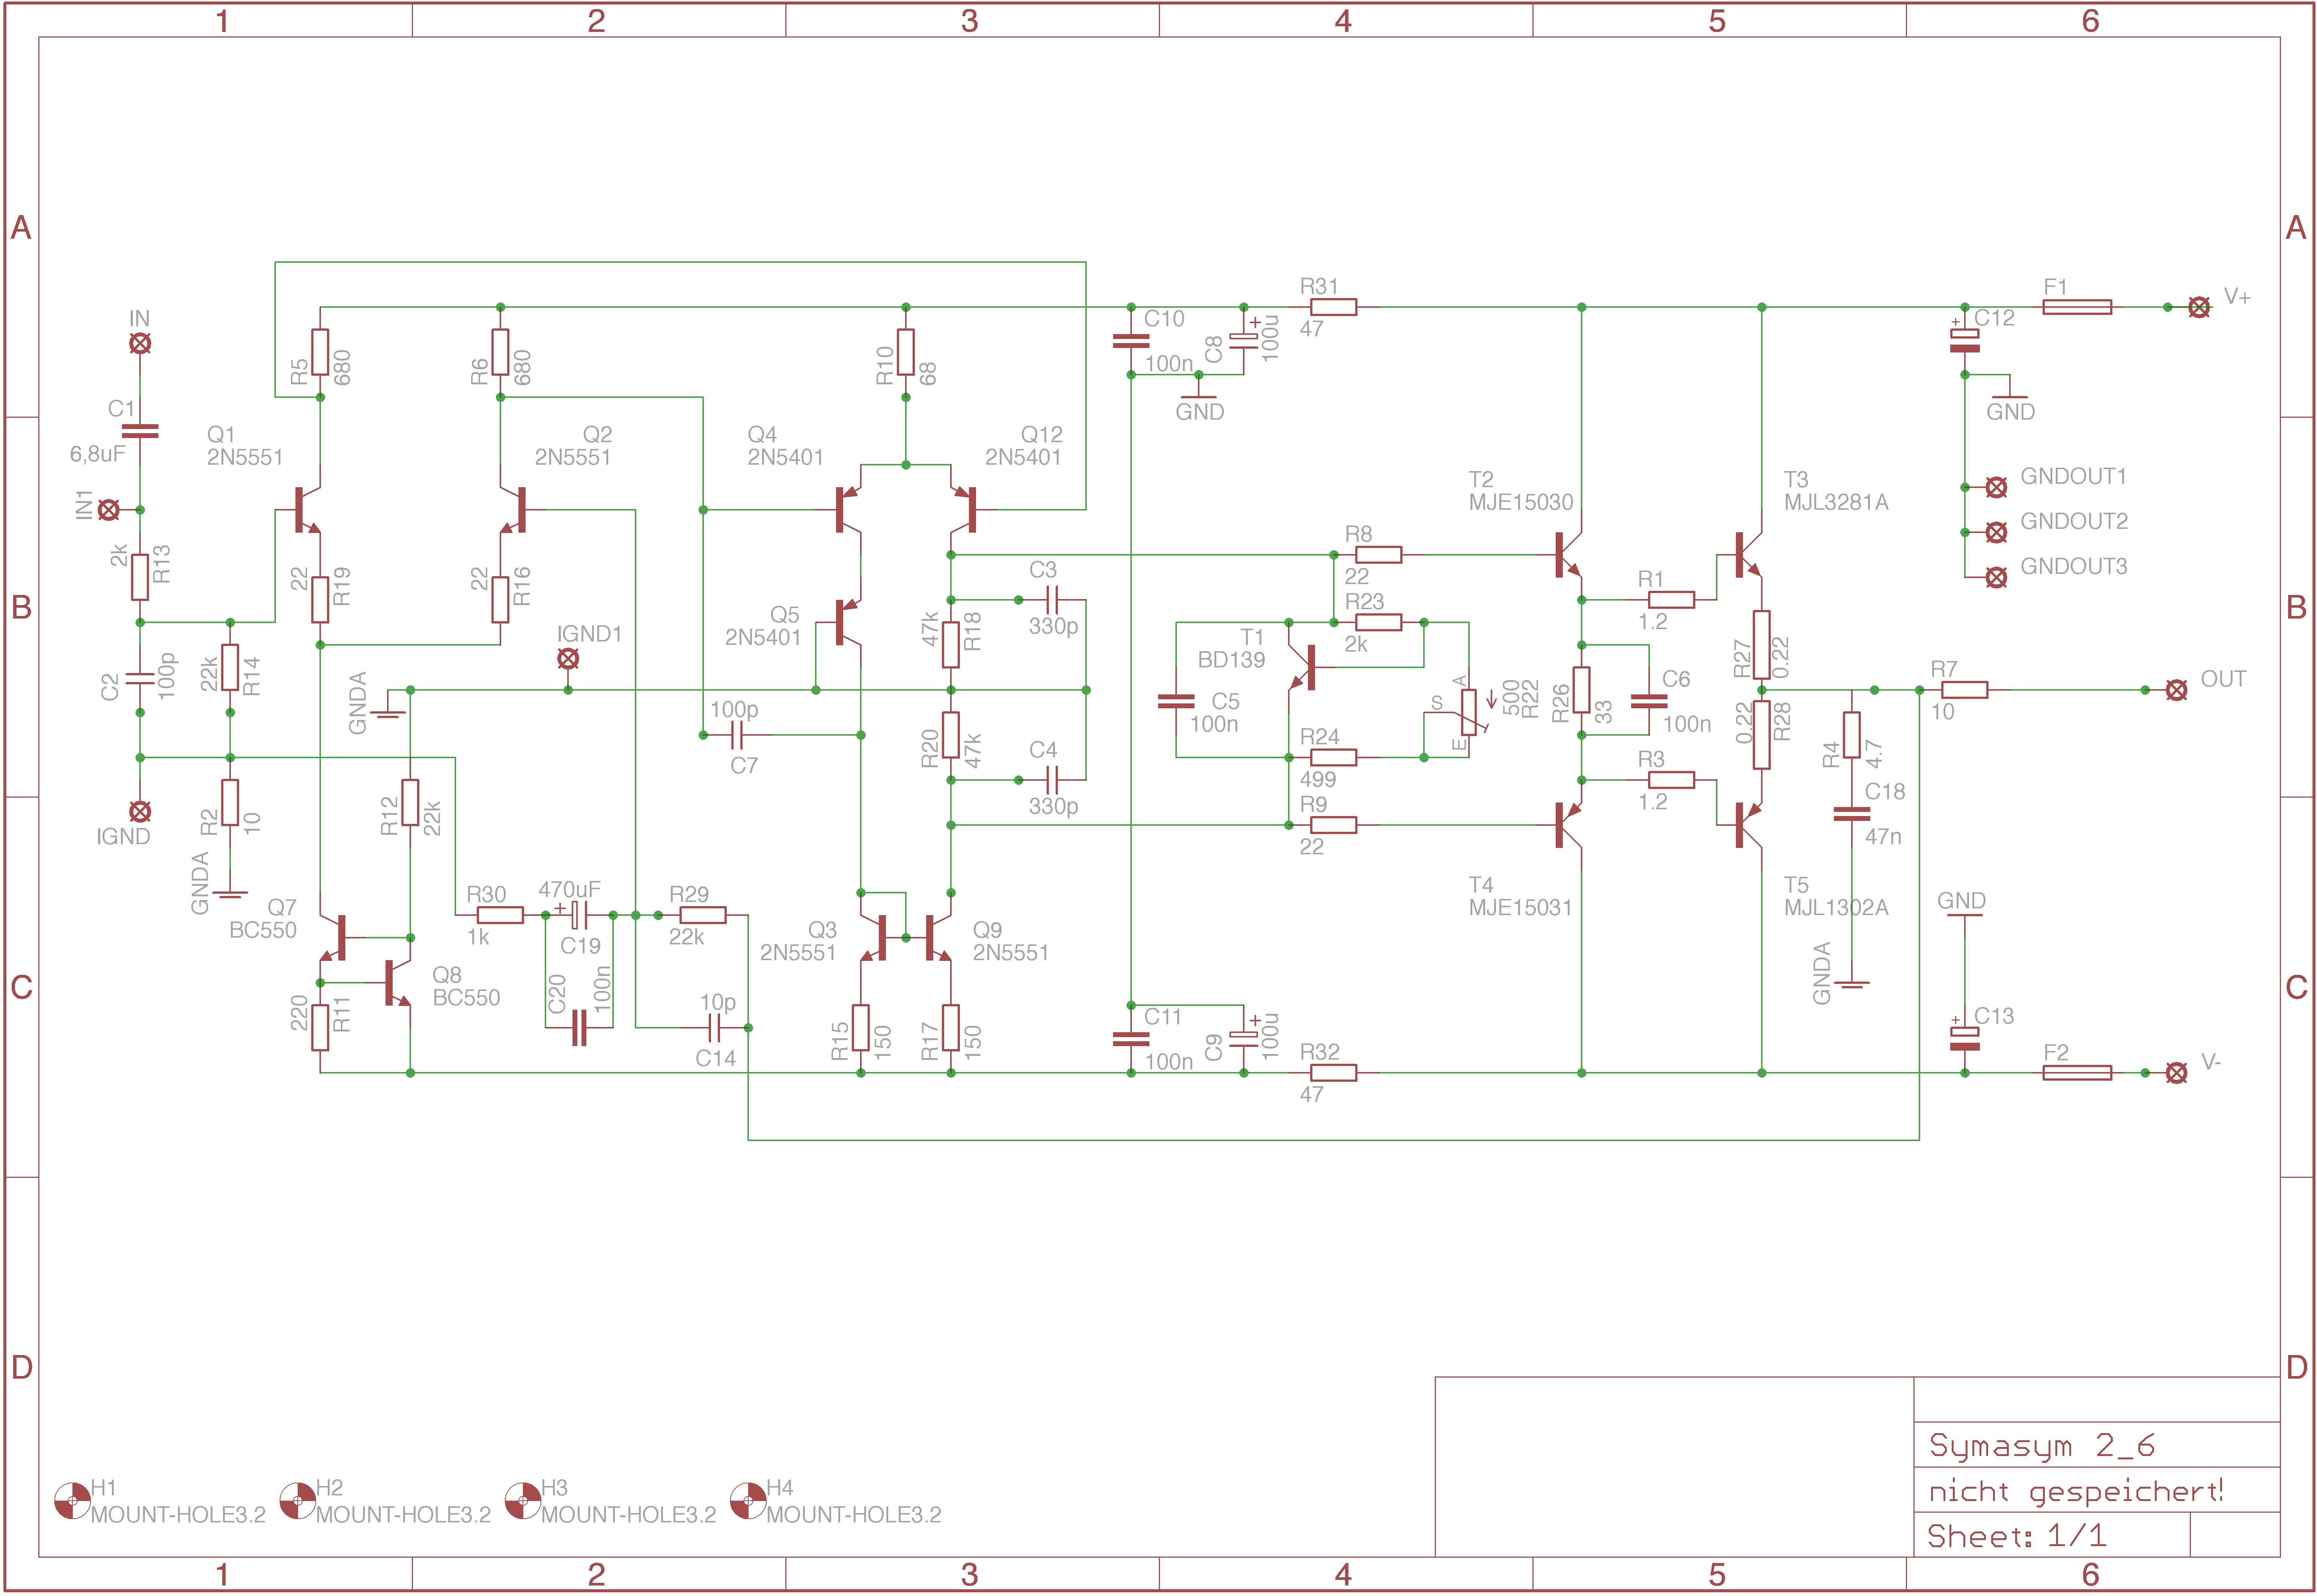 Erfreut Lautsprecher Schaltpläne Fotos - Schaltplan Serie Circuit ...